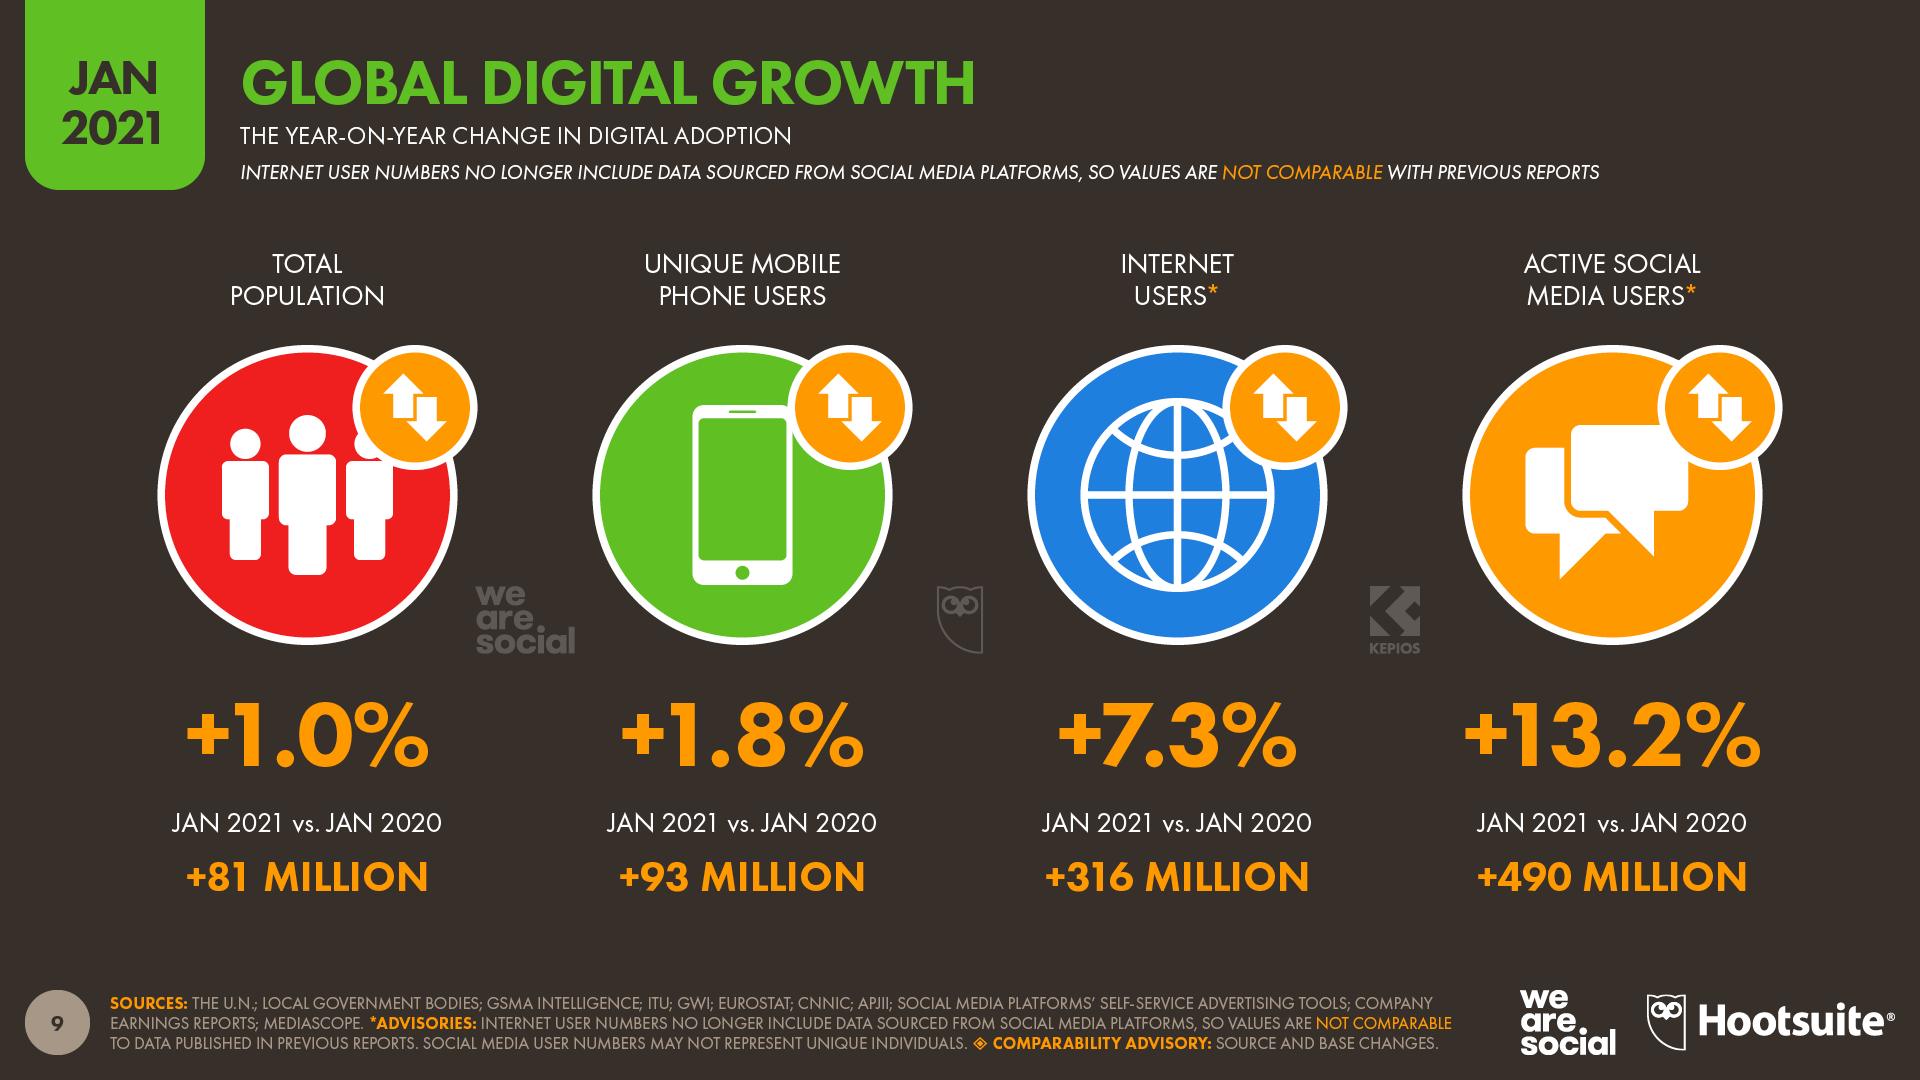 Annual Global Digital Growth January 2021 DataReportal